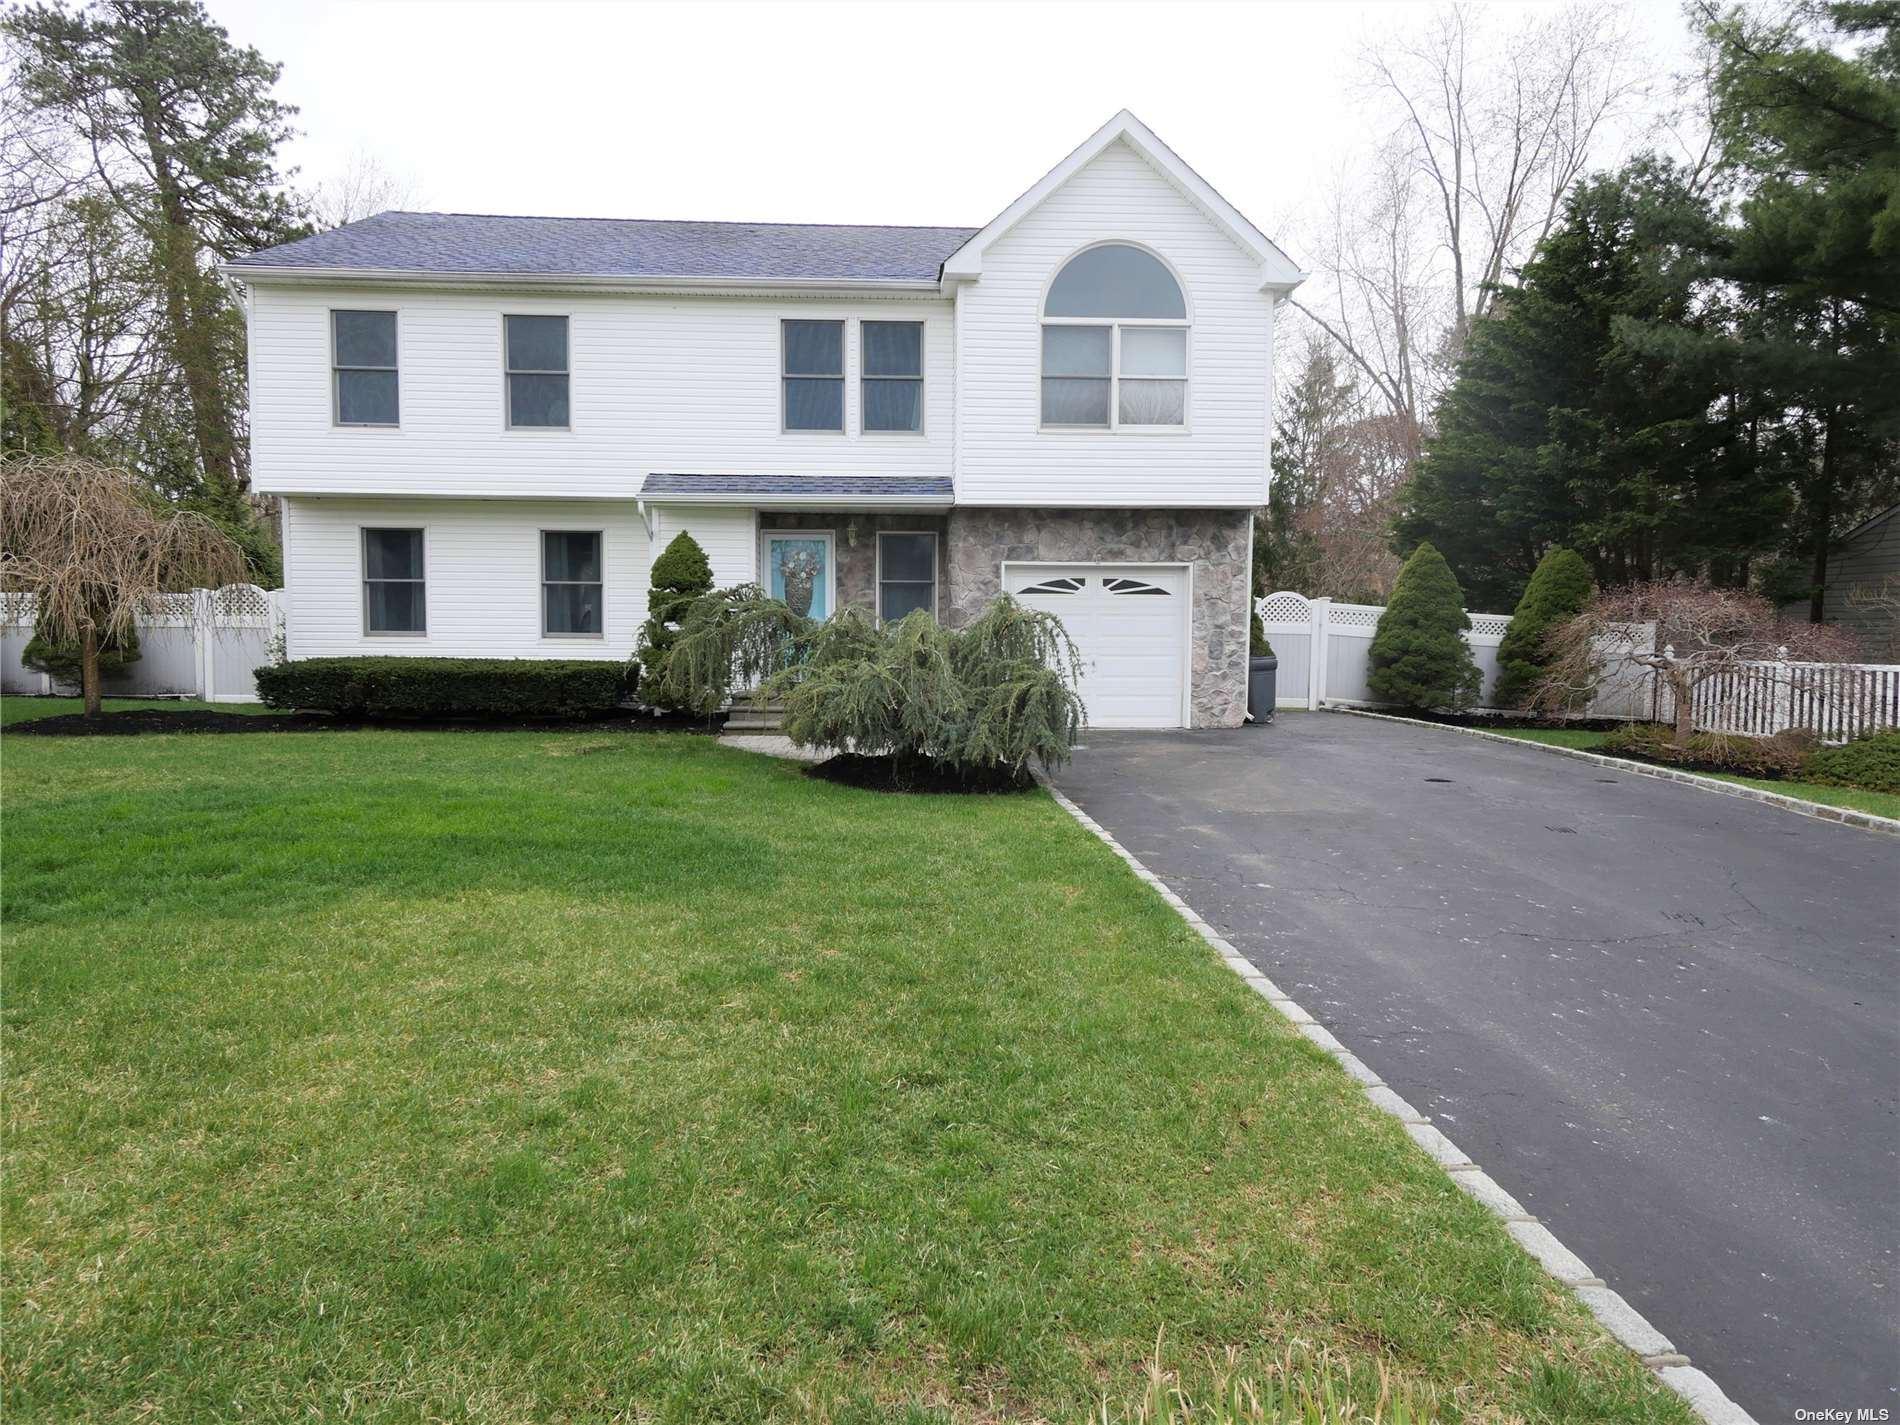 10 Marc Drive, Ridge, NY 11961 - MLS#: 3302754